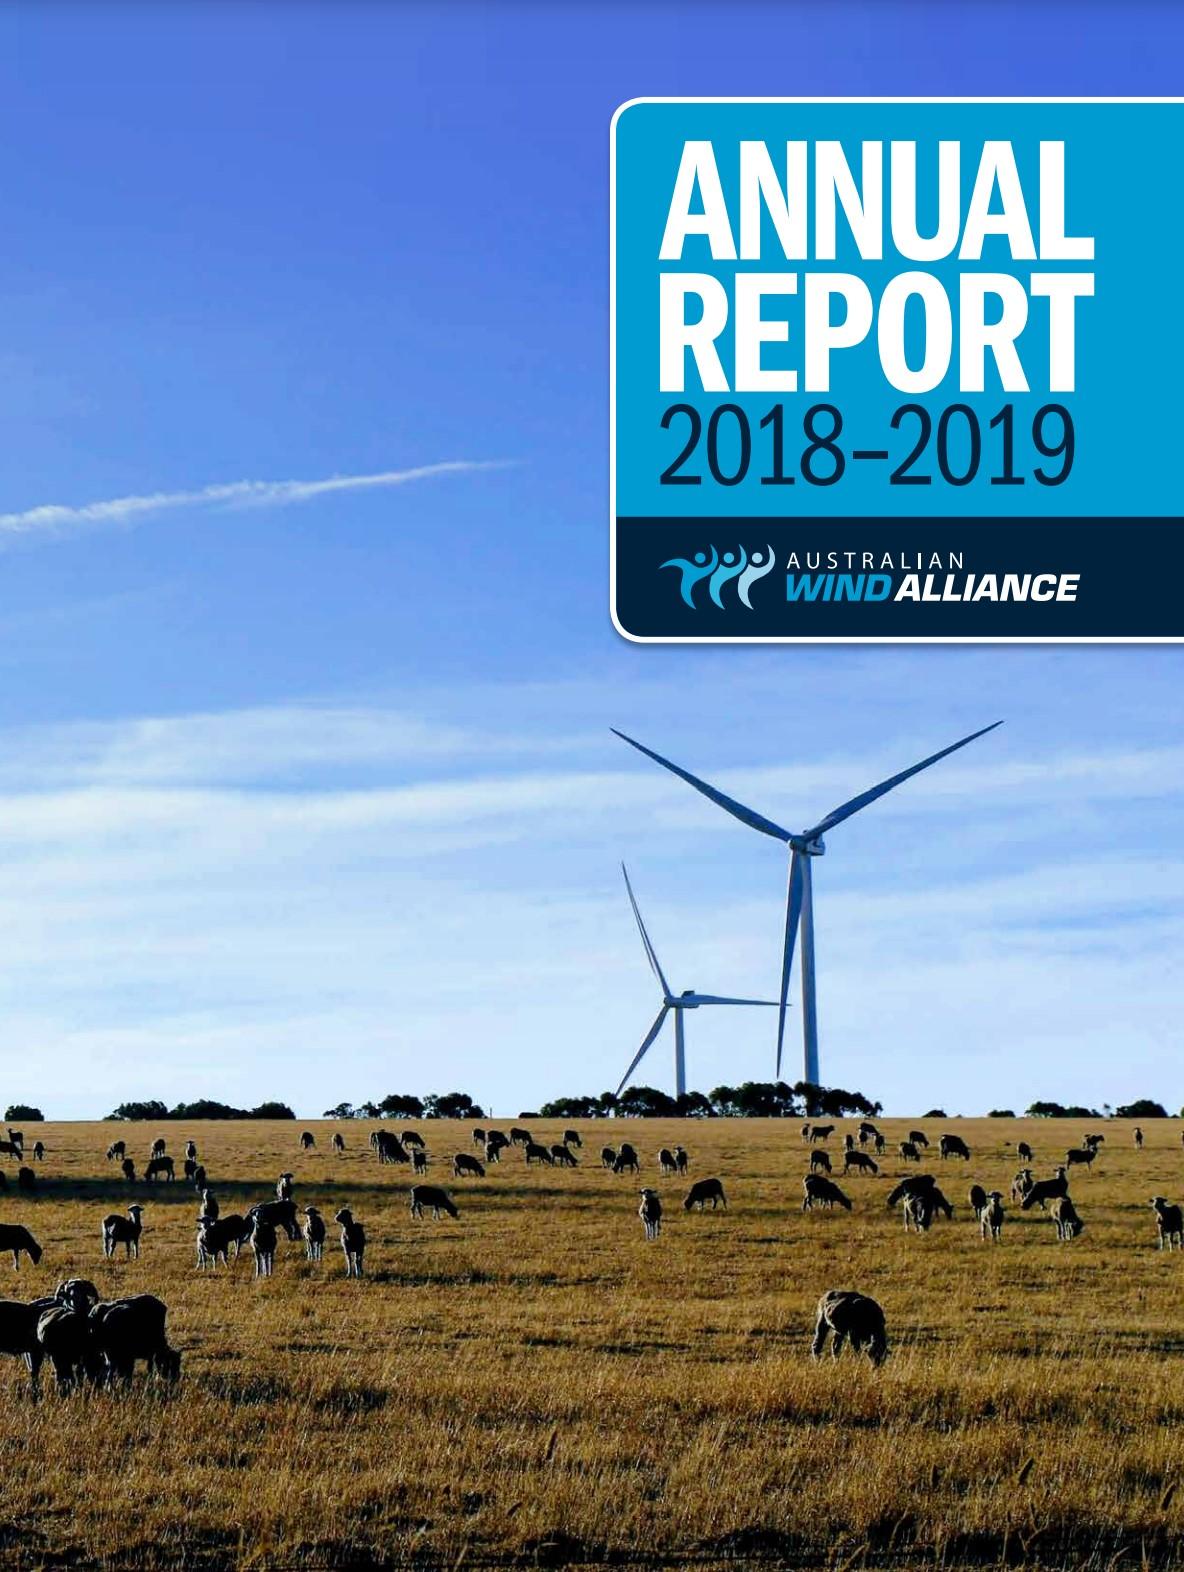 Annual_Report_thumb_1819.jpg